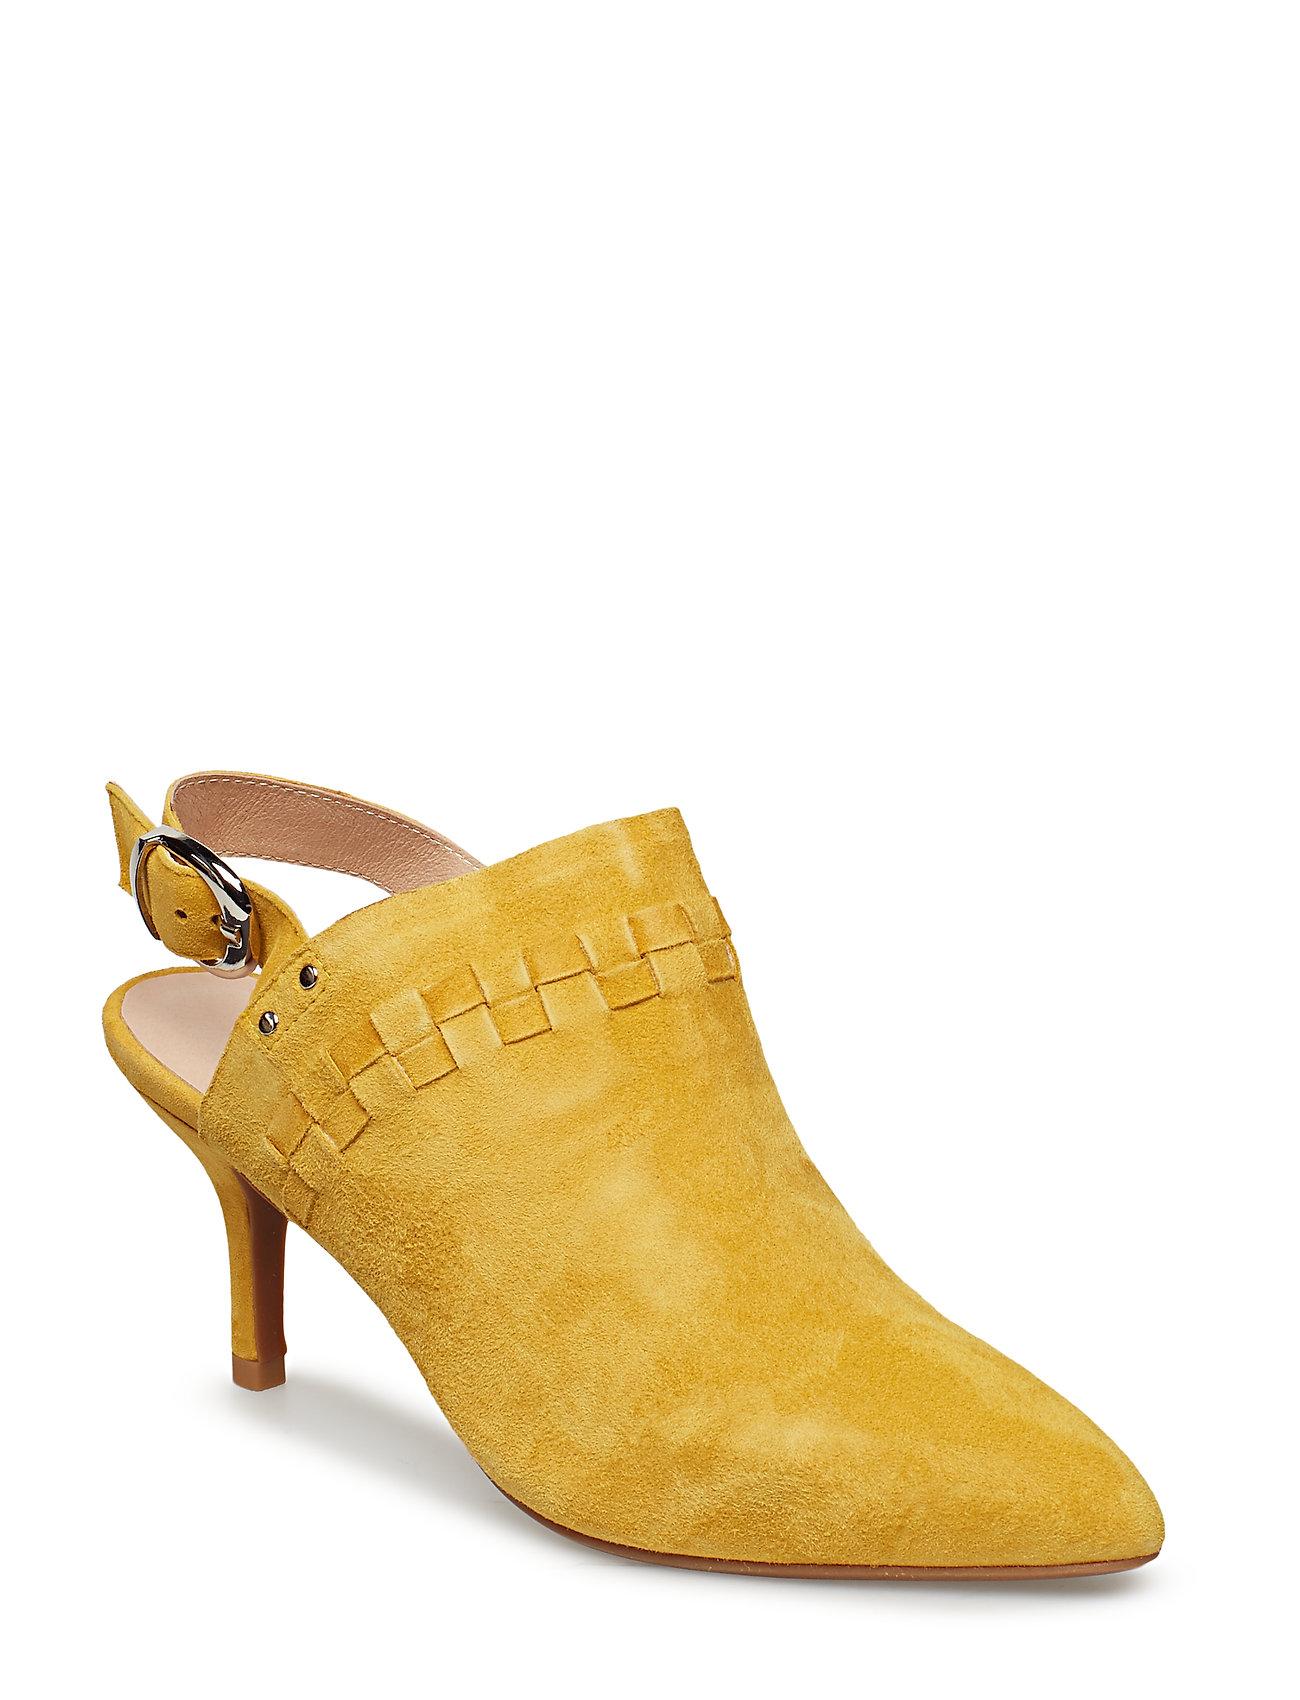 Shoe The Bear AGNETE SLINGBACK S - YELLOW